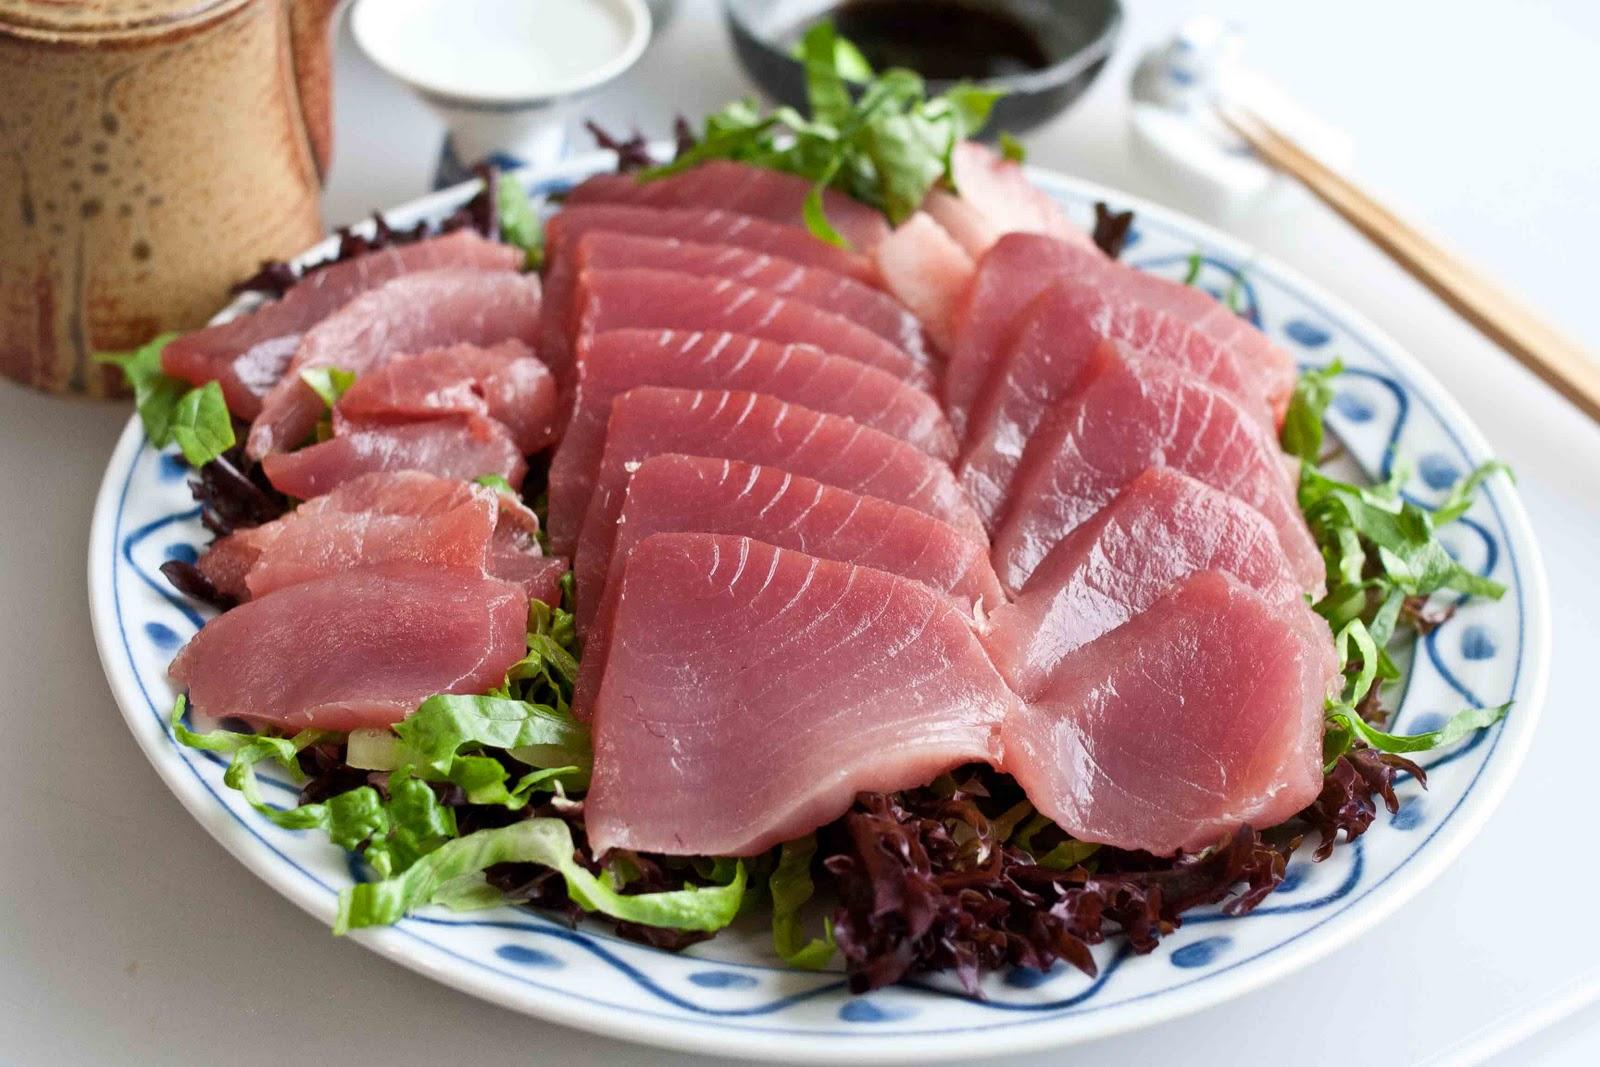 FOODjimoto: Sashimi--Pacific Bluefin Tuna